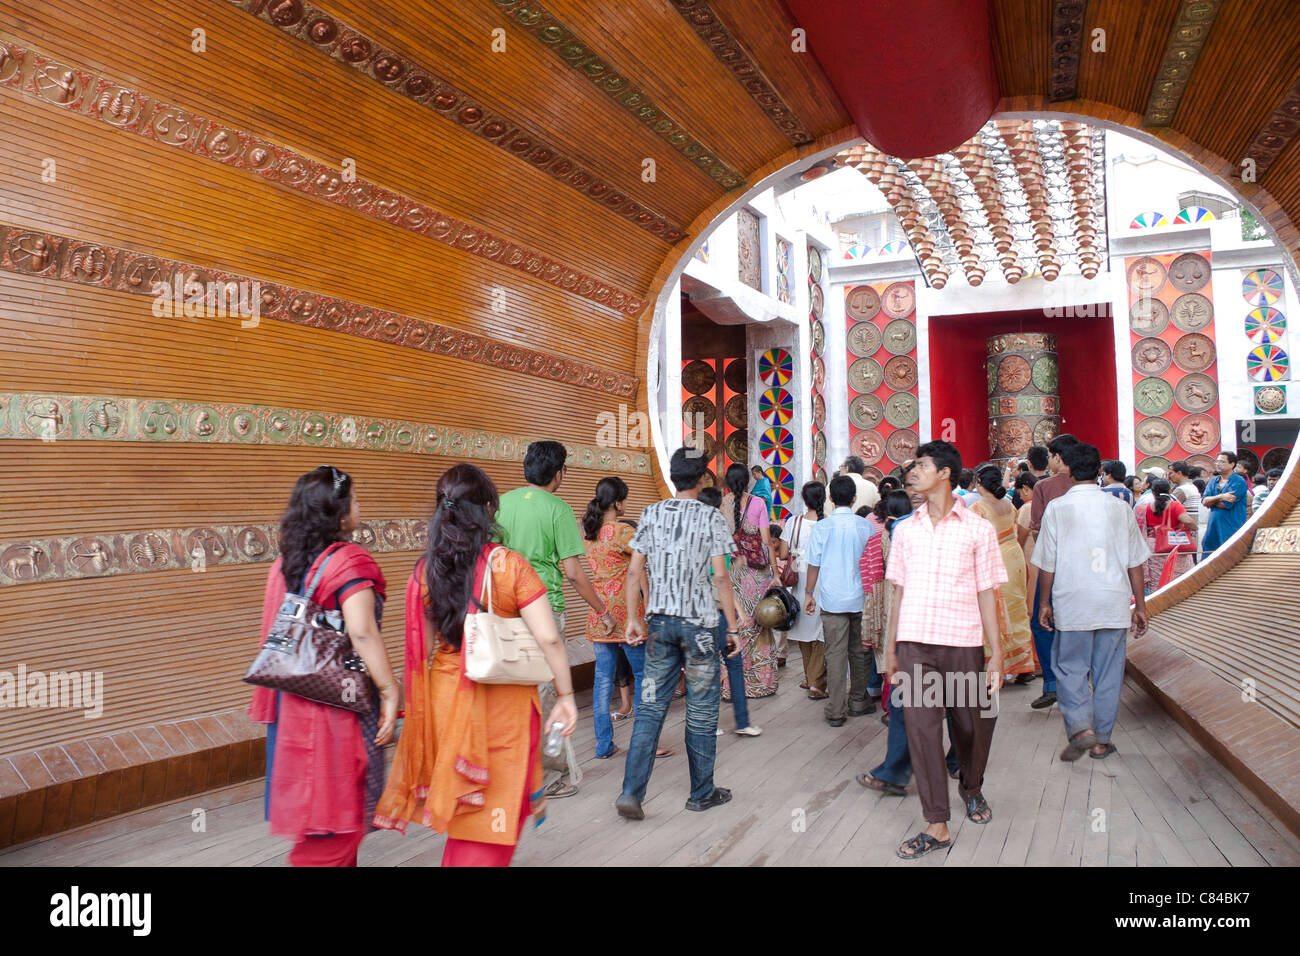 Grand wooden entry at 'Bose Pukur Durga Puja pandal' in Kasba, Kolkata (Calcutta), West Bengal, India. - Stock Image